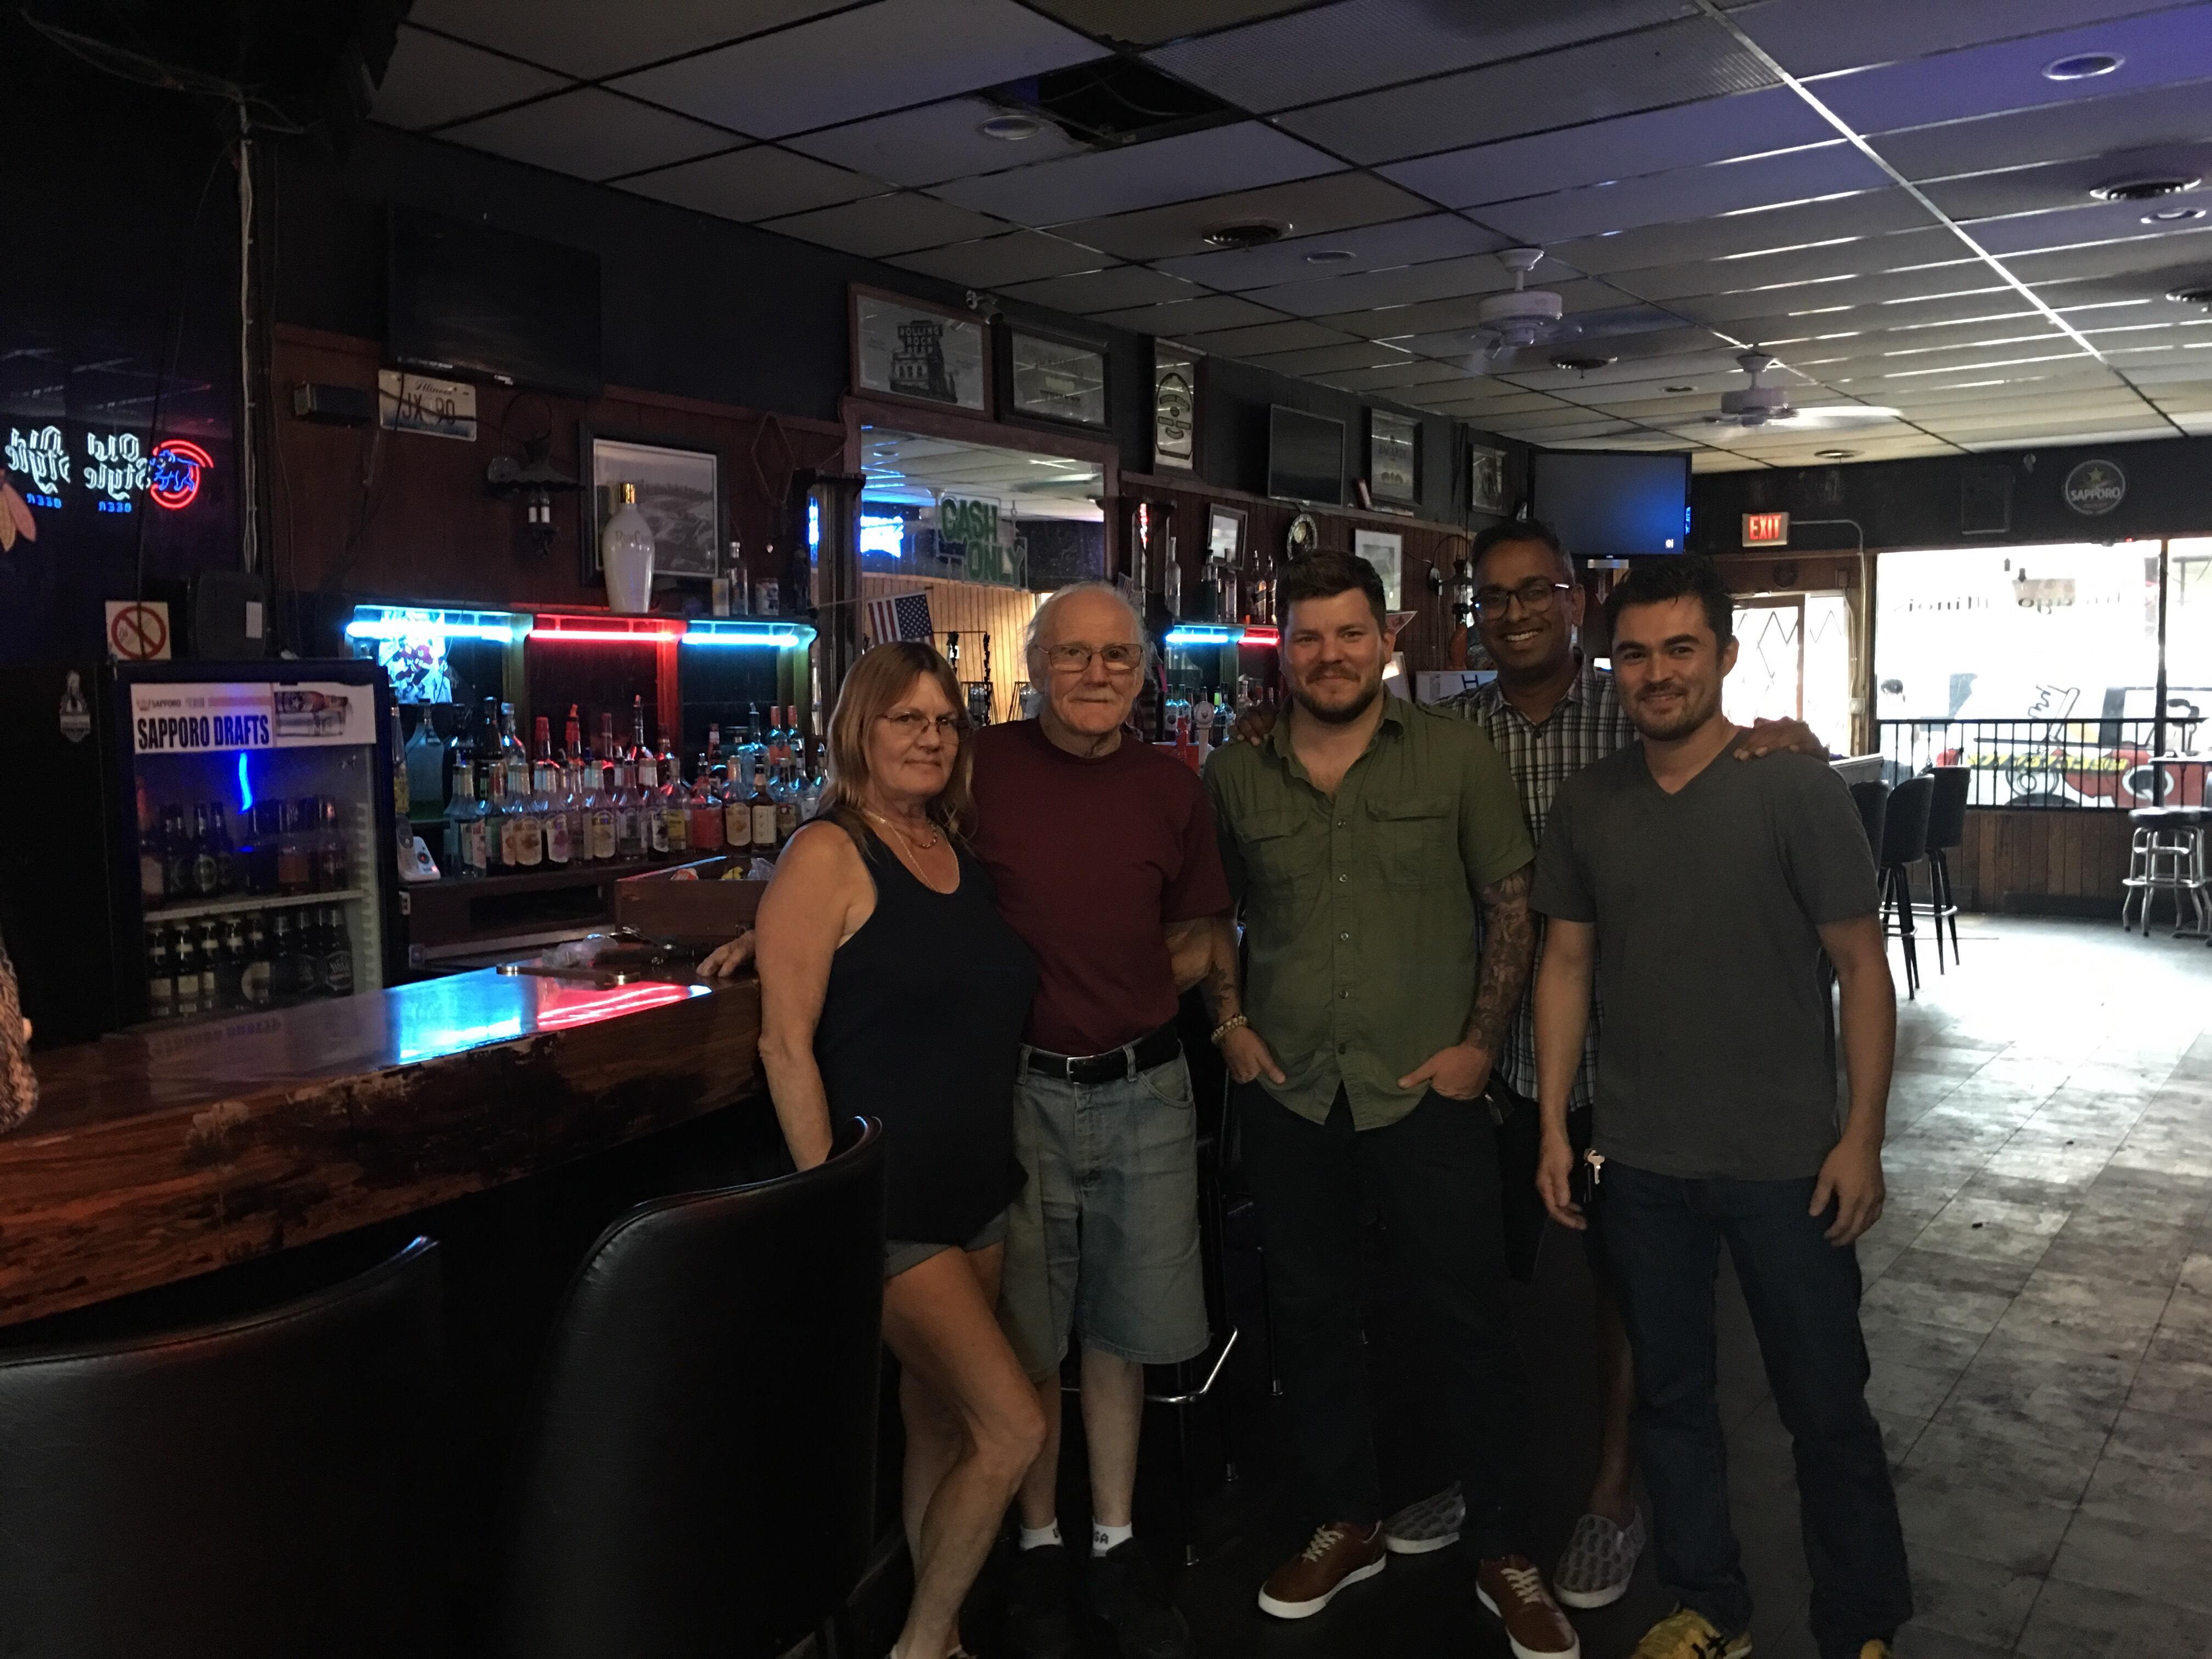 Two Way owner Glenn Miller and his wife, Dustin Drankiewicz, Anshul Mangal, Shin Thompson